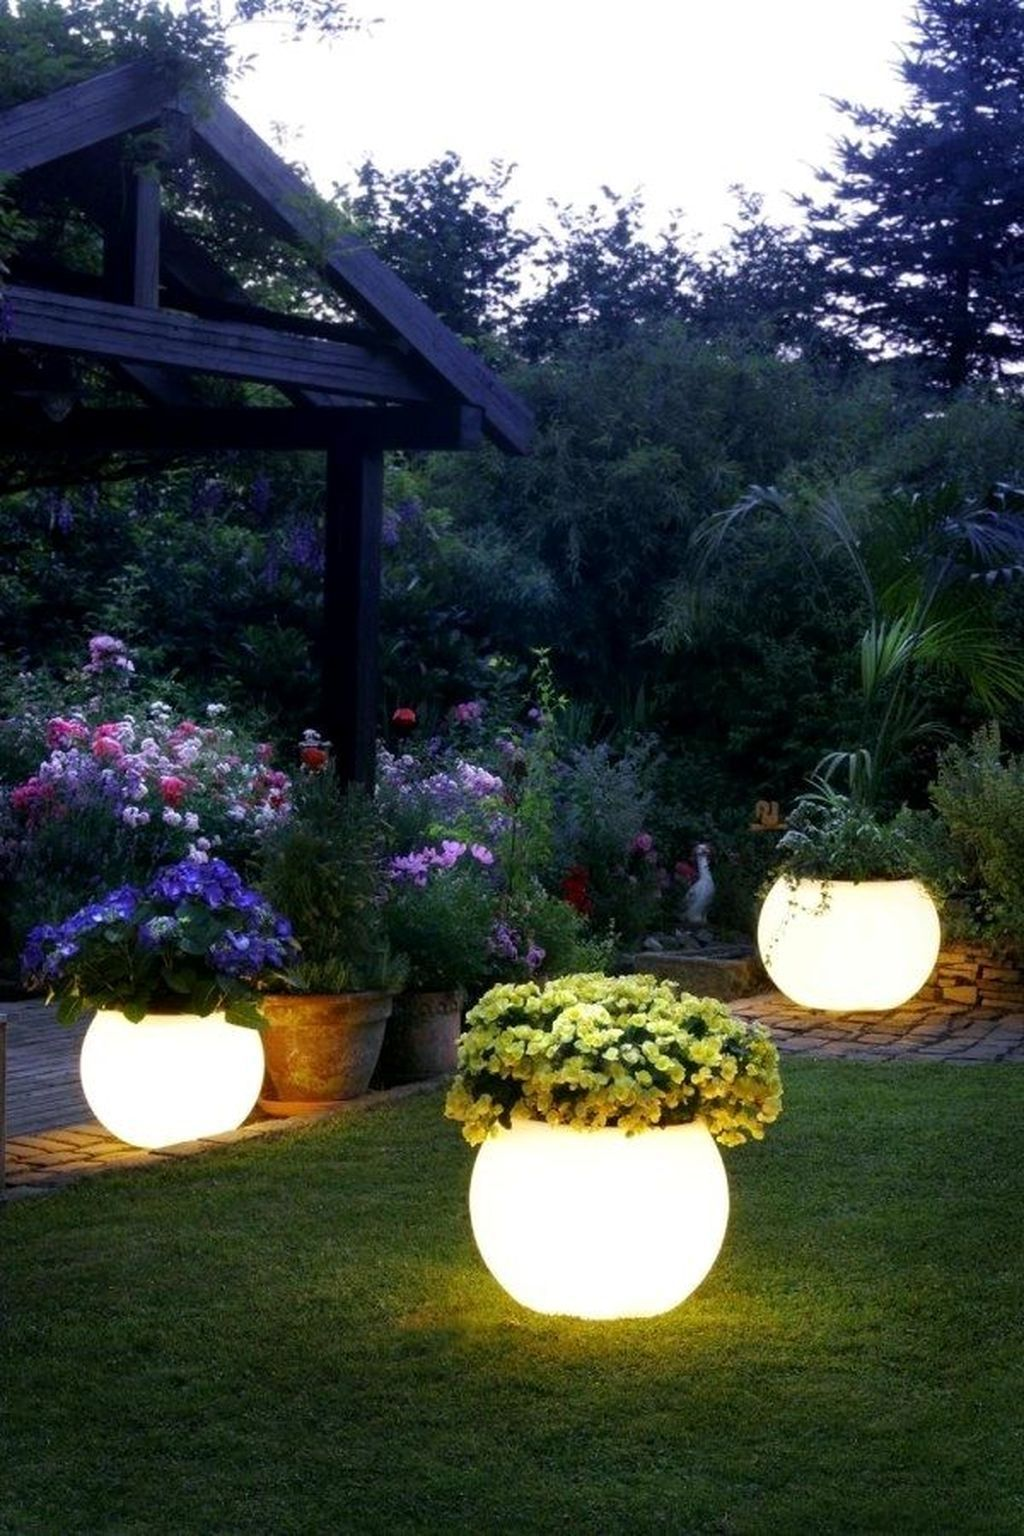 20 Beautiful Light Design Ideas For Garden In 2020 Solar Lights